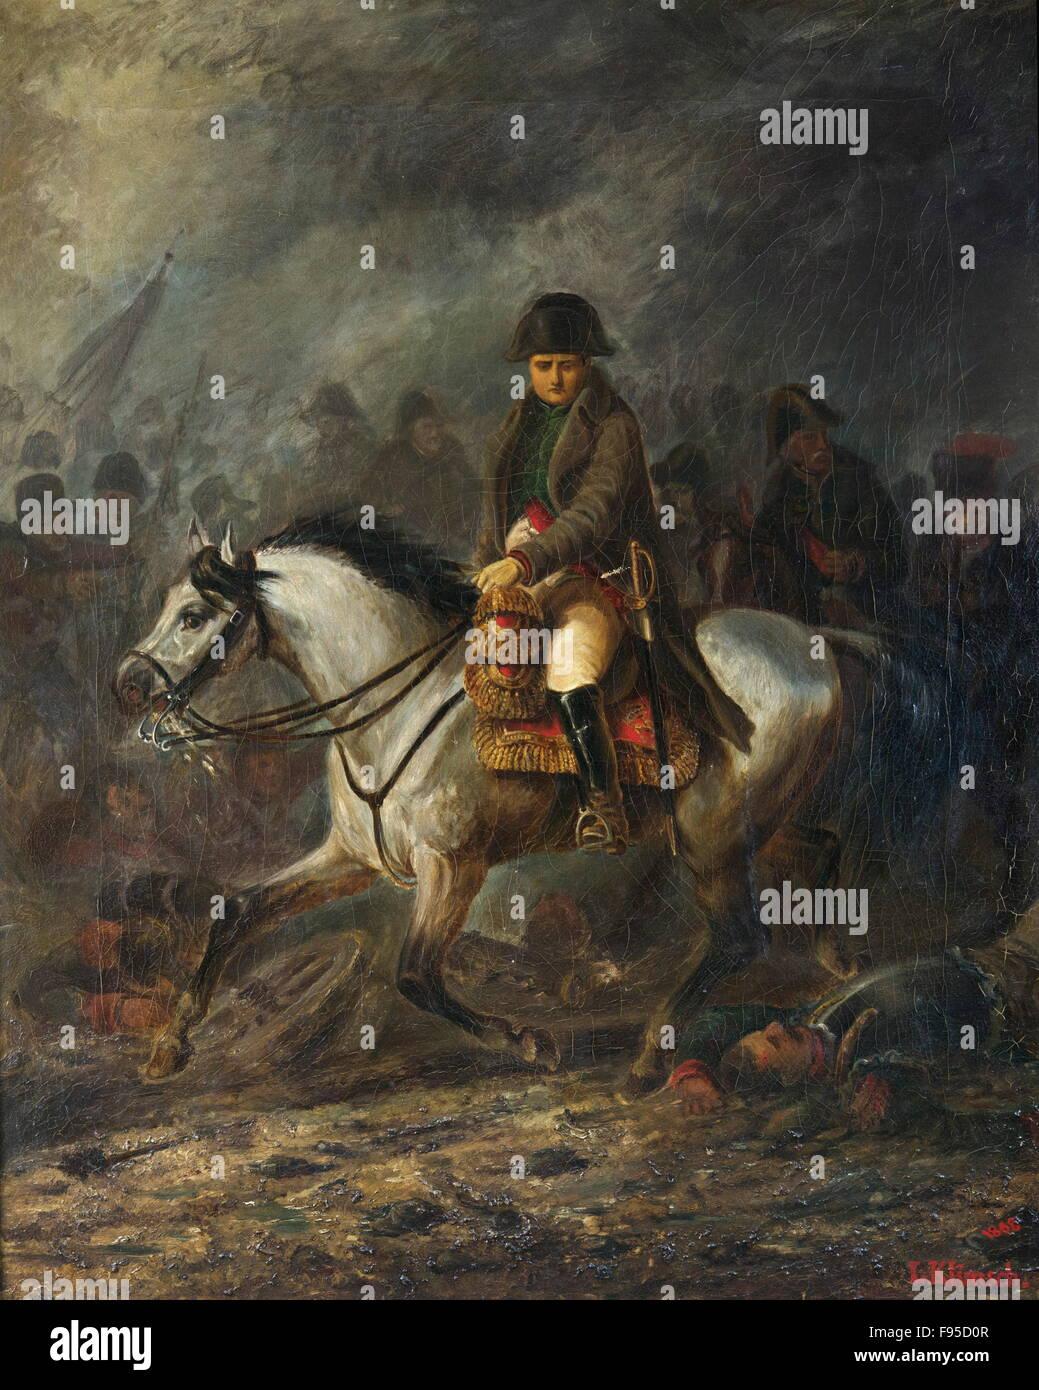 Battle of Waterloo - Simple English Wikipedia, the free encyclopedia